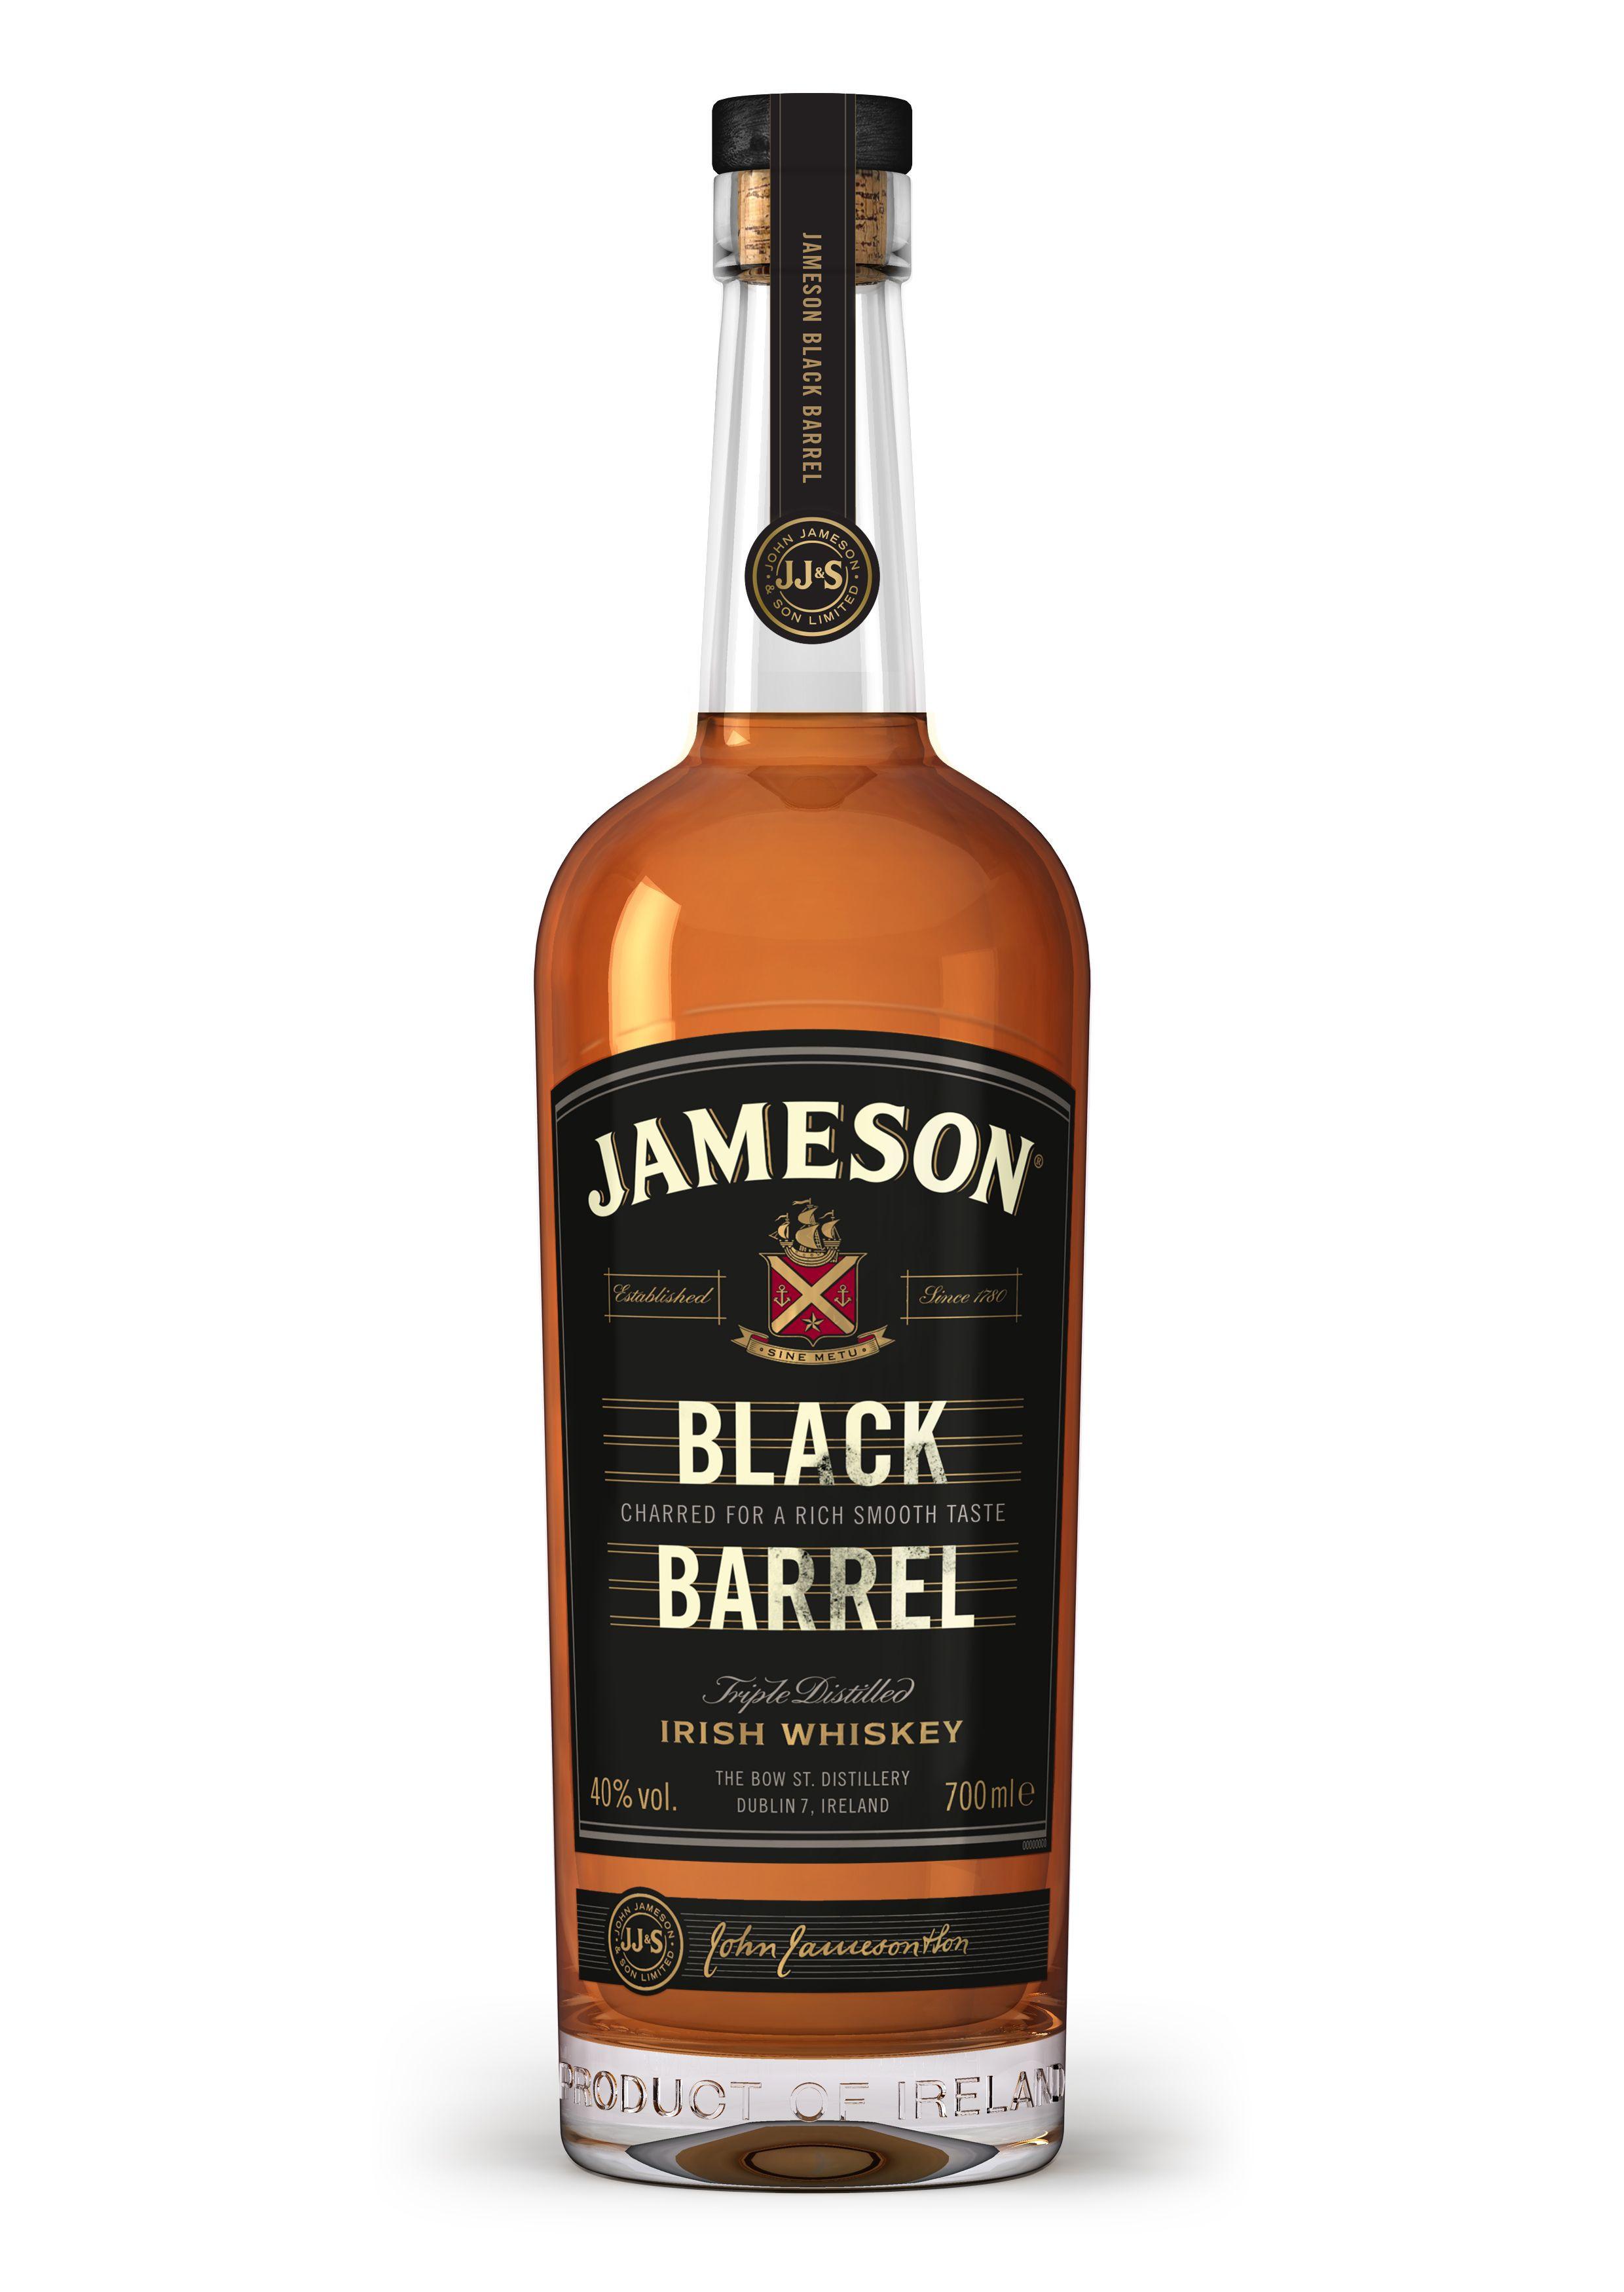 Propostas Dia do Pai: Jameson 18 e Jameson Black Barrel